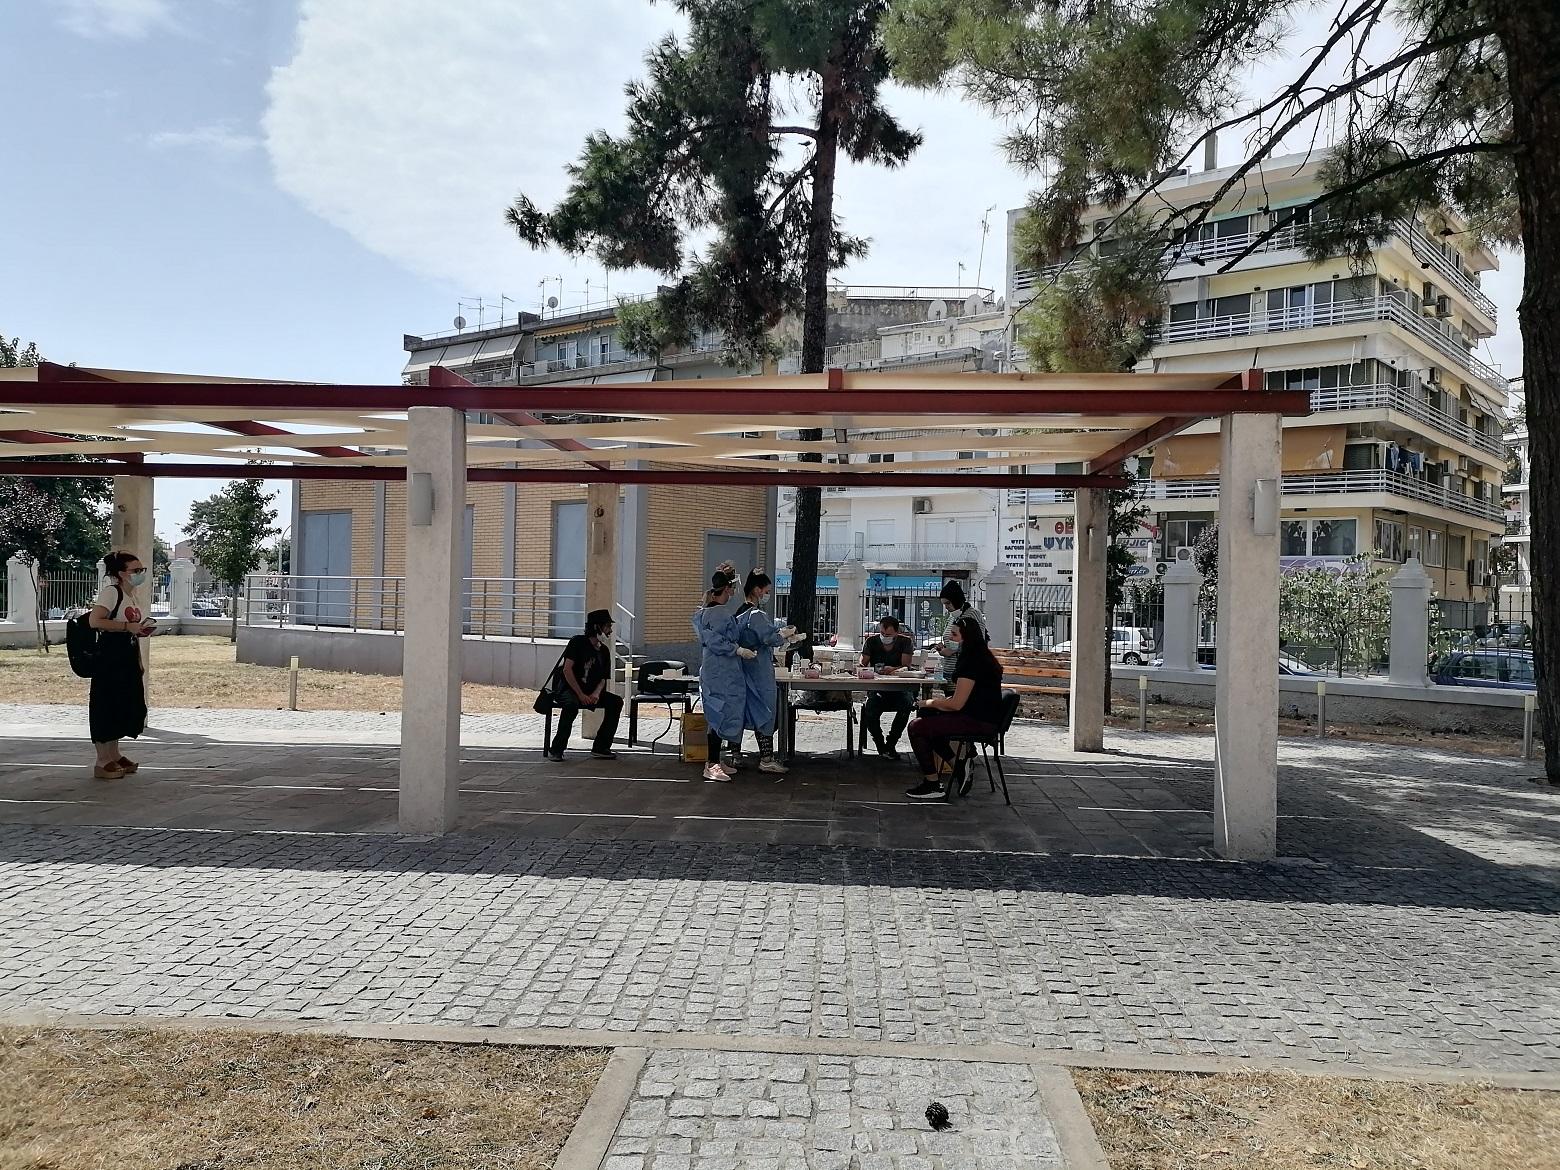 Rapid tests στη Διεύθυνση Υγείας και τη Δημοτική Βιβλιοθήκη